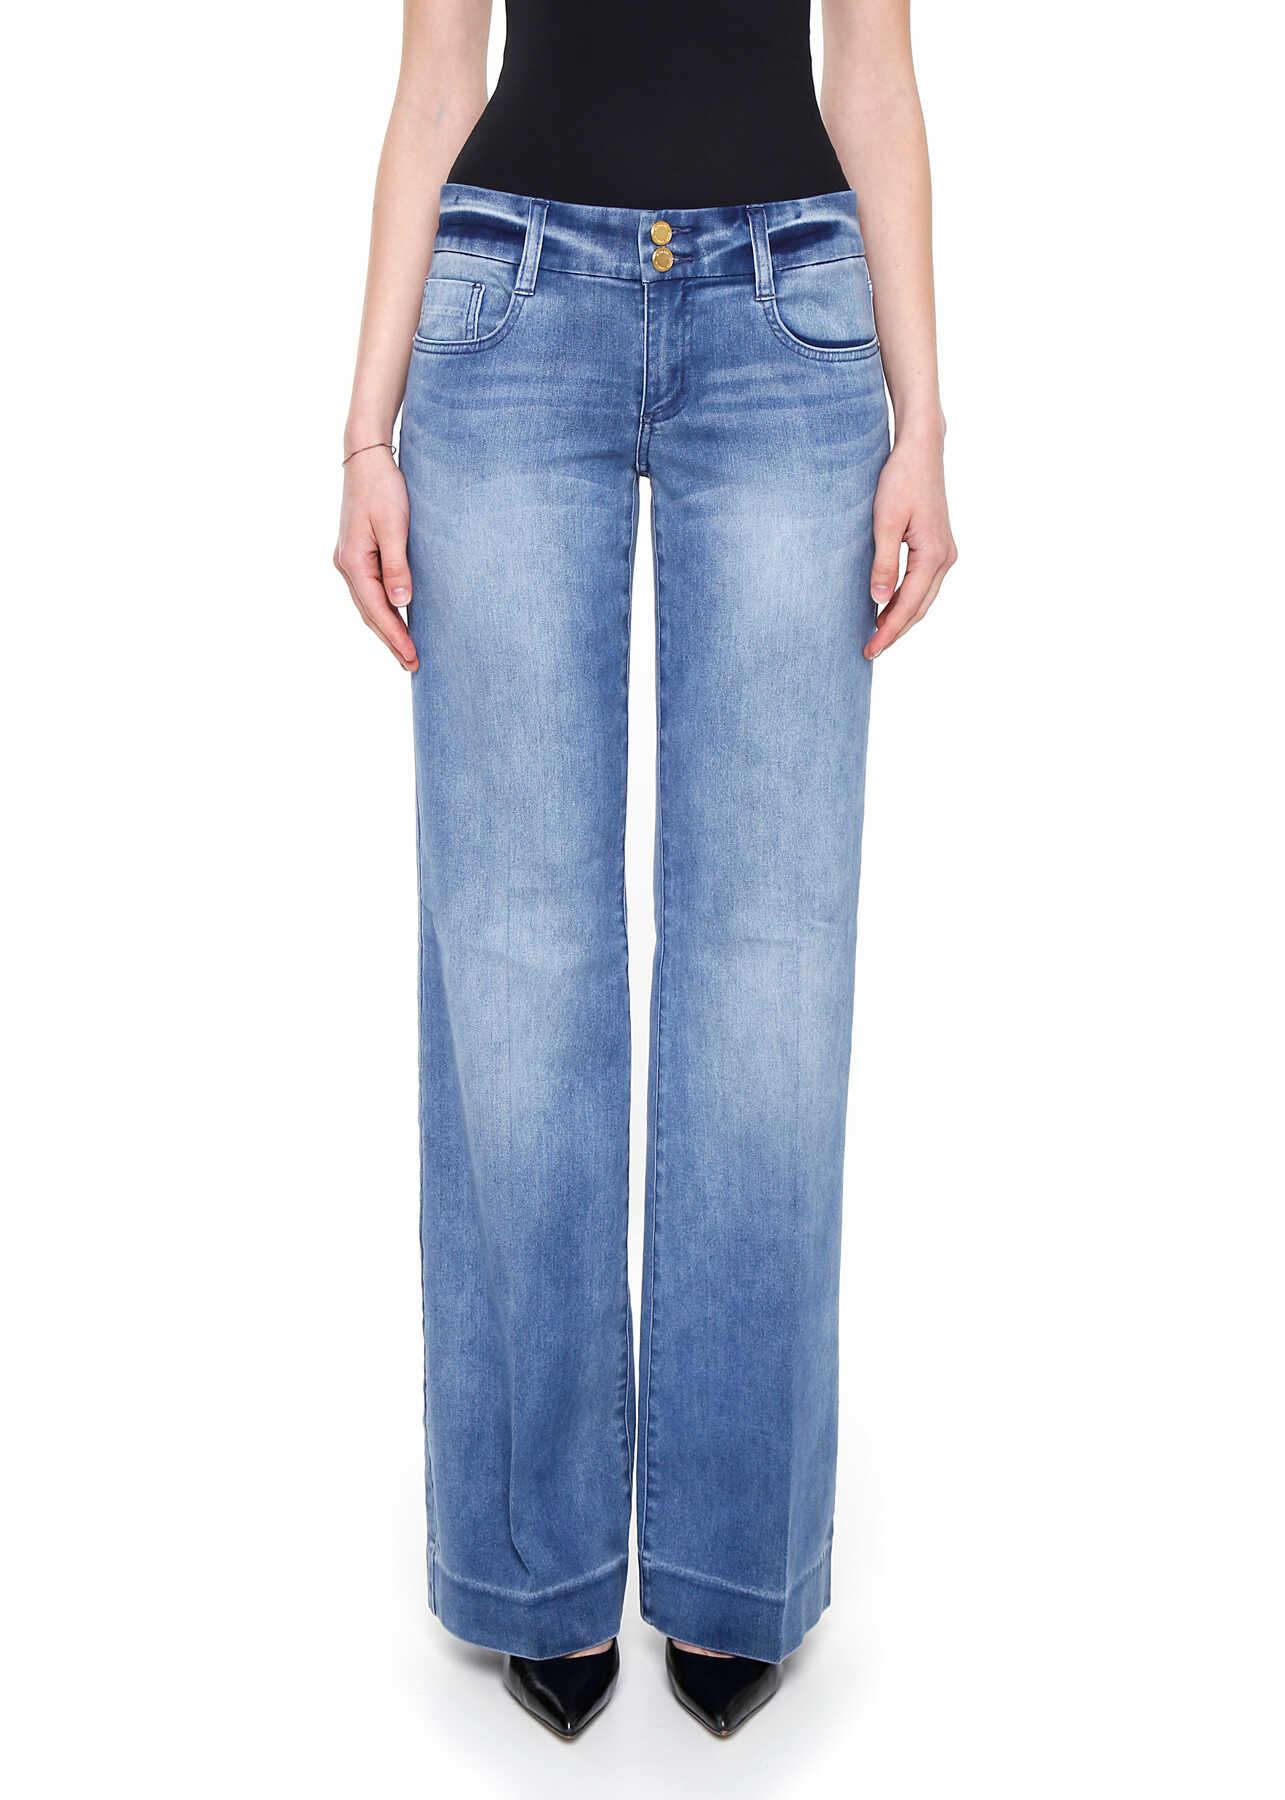 Blugi Femei Michael Kors Flare Jeans Five Pockets